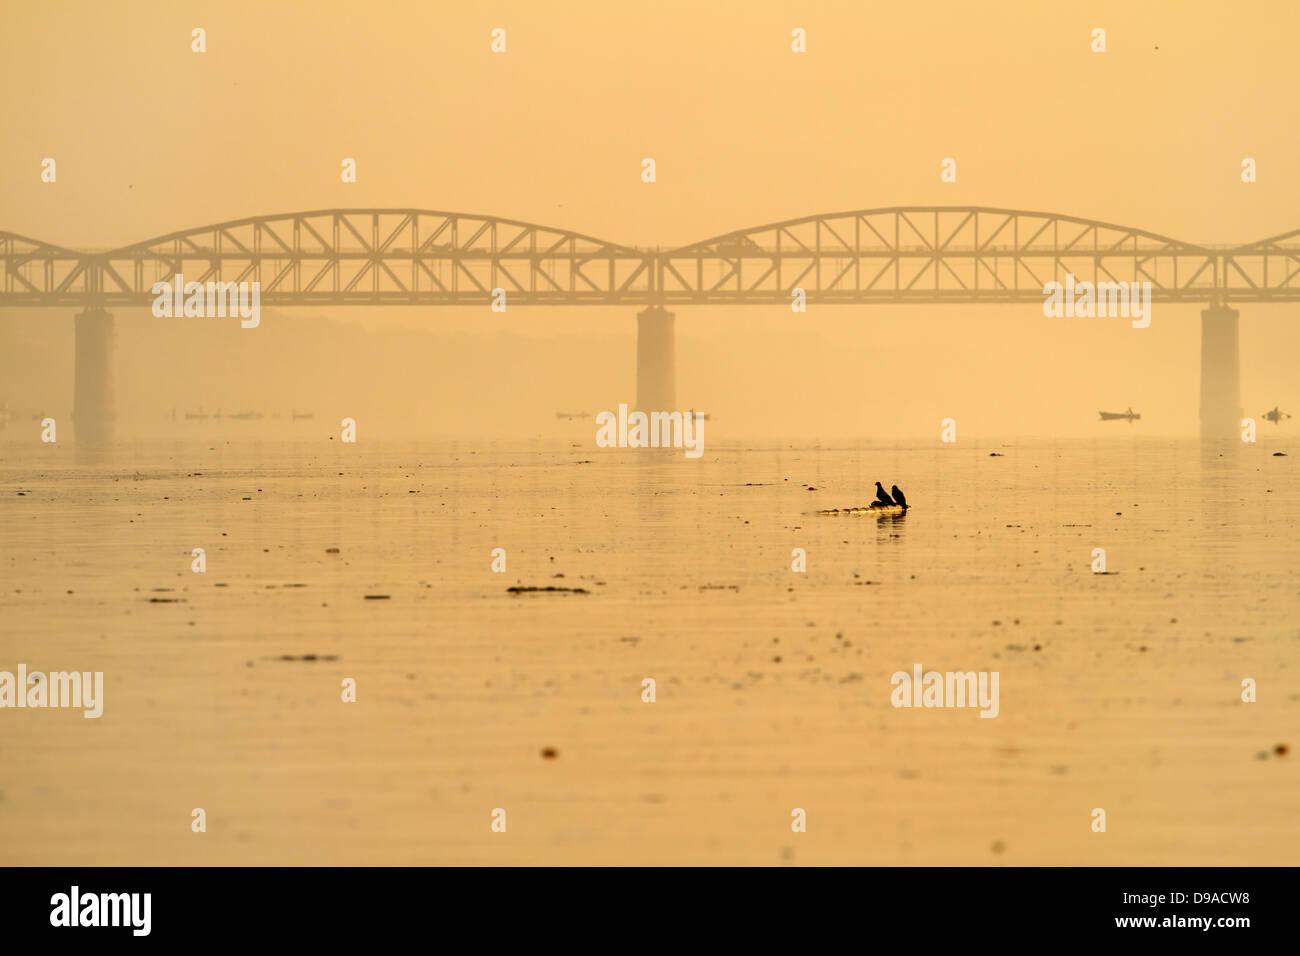 View at the polluted Ganges river in Varanasi, Uttar Pradesh, India - Stock Image